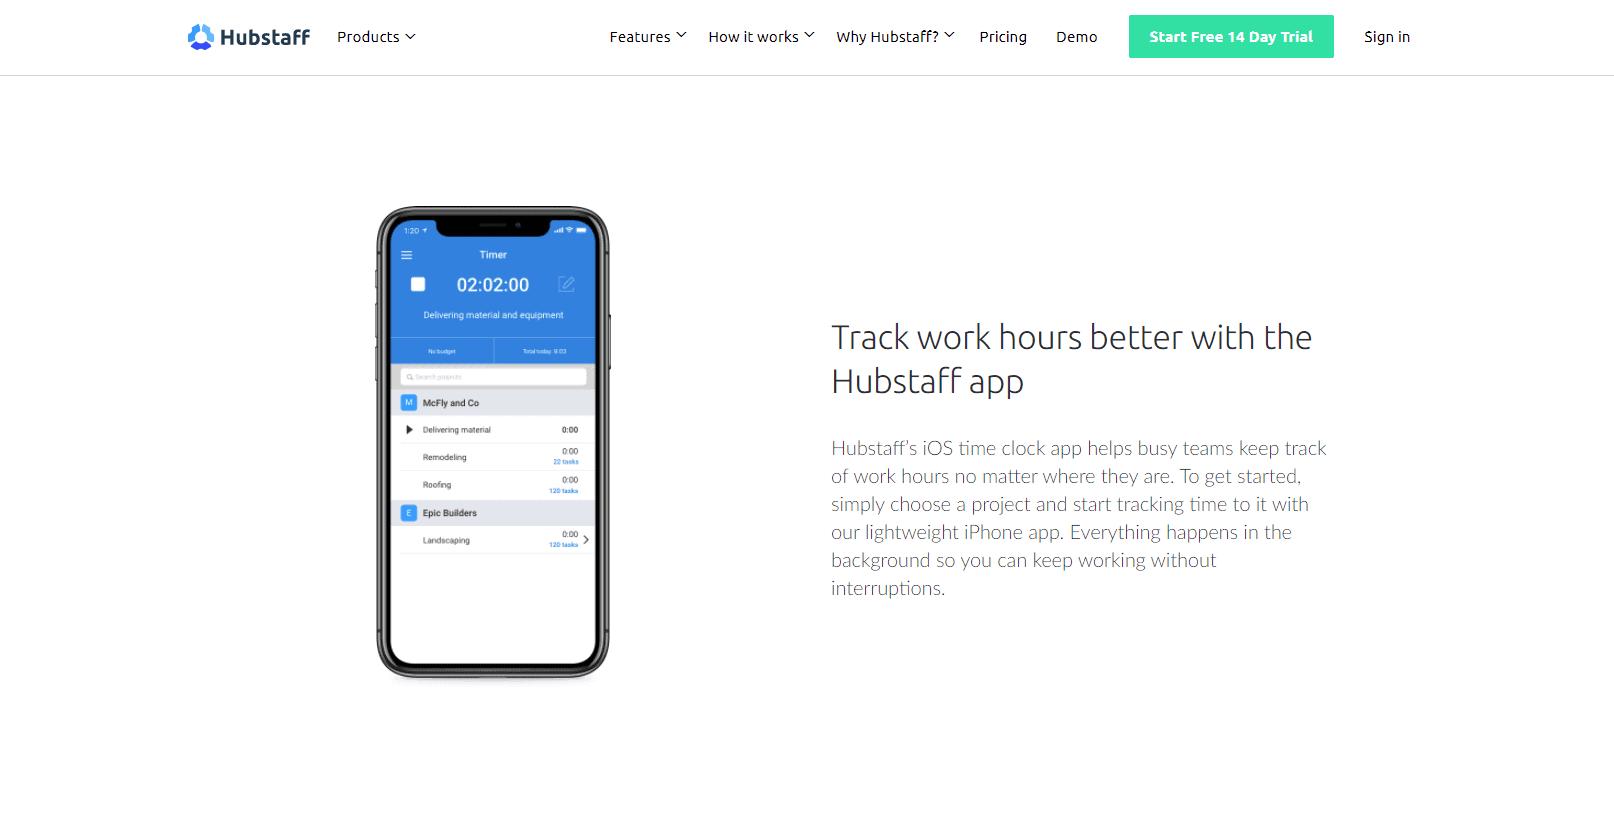 Hubstaff for iOS